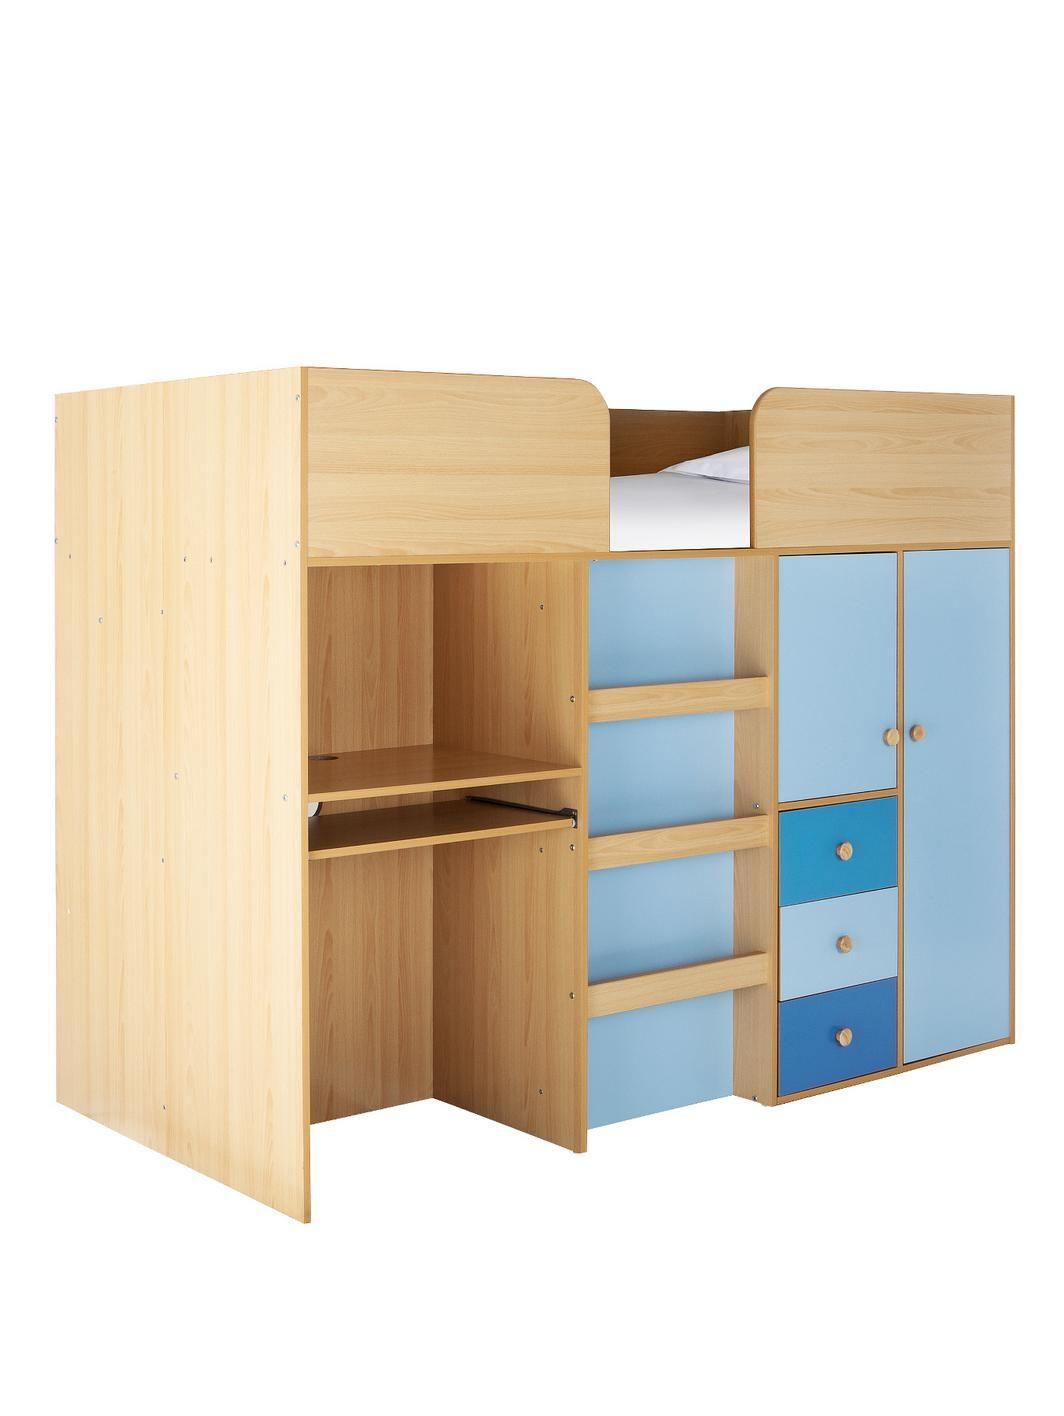 Metro Bedroom Furniture Metro Kids Mid Sleeper Bed Desk And Storage Kid Desks And Beds